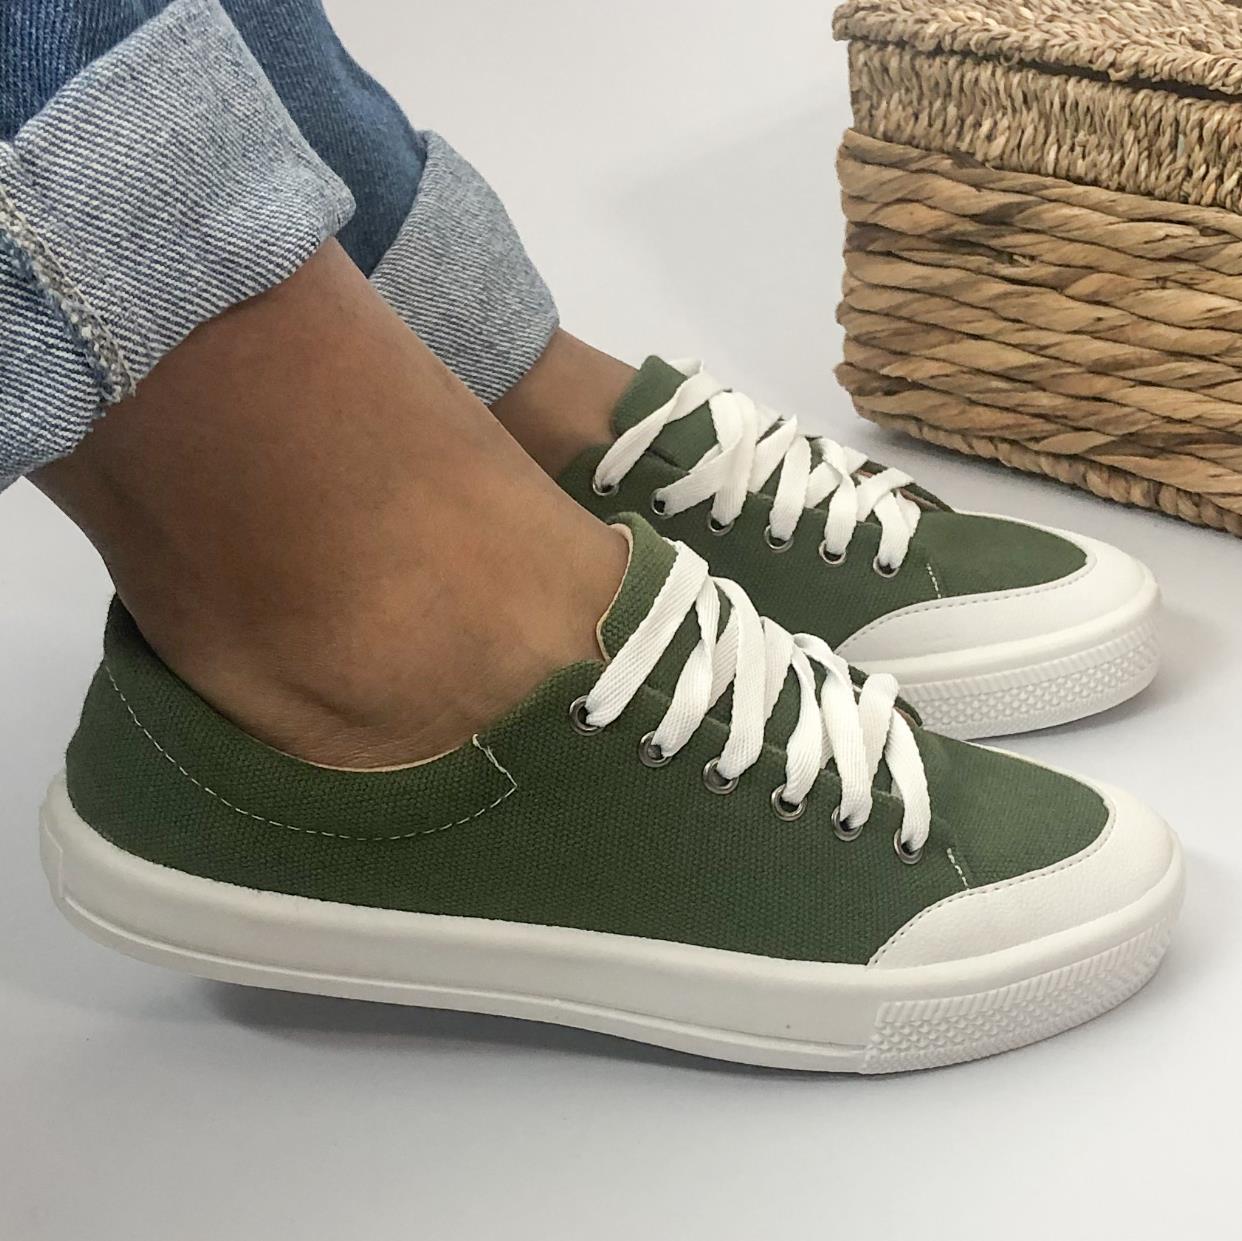 Tênis Feminino Casual With Lace Verde Militar